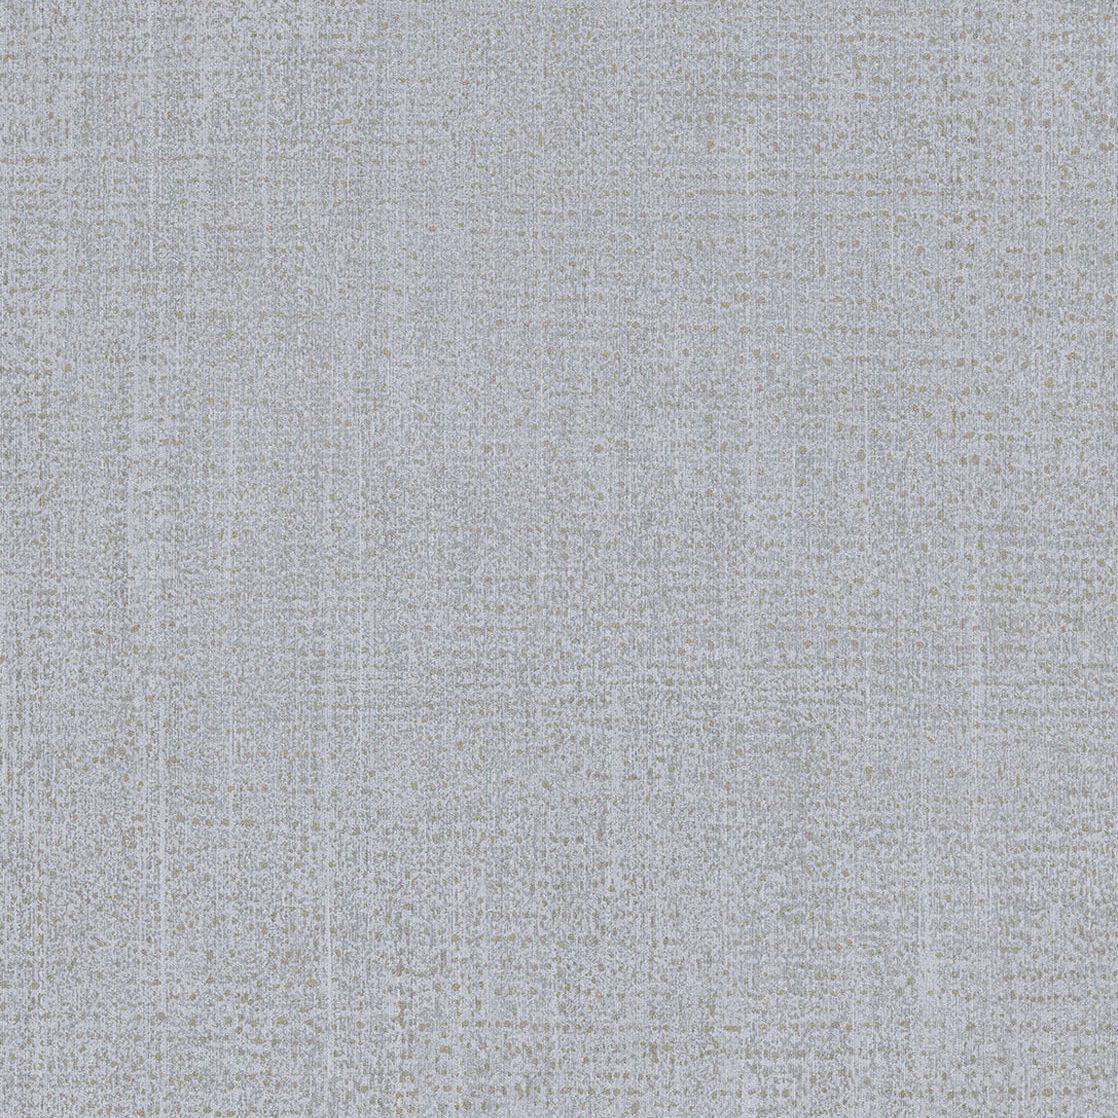 Eijffinger Masterpiece cinkszürke színű uni tapéta